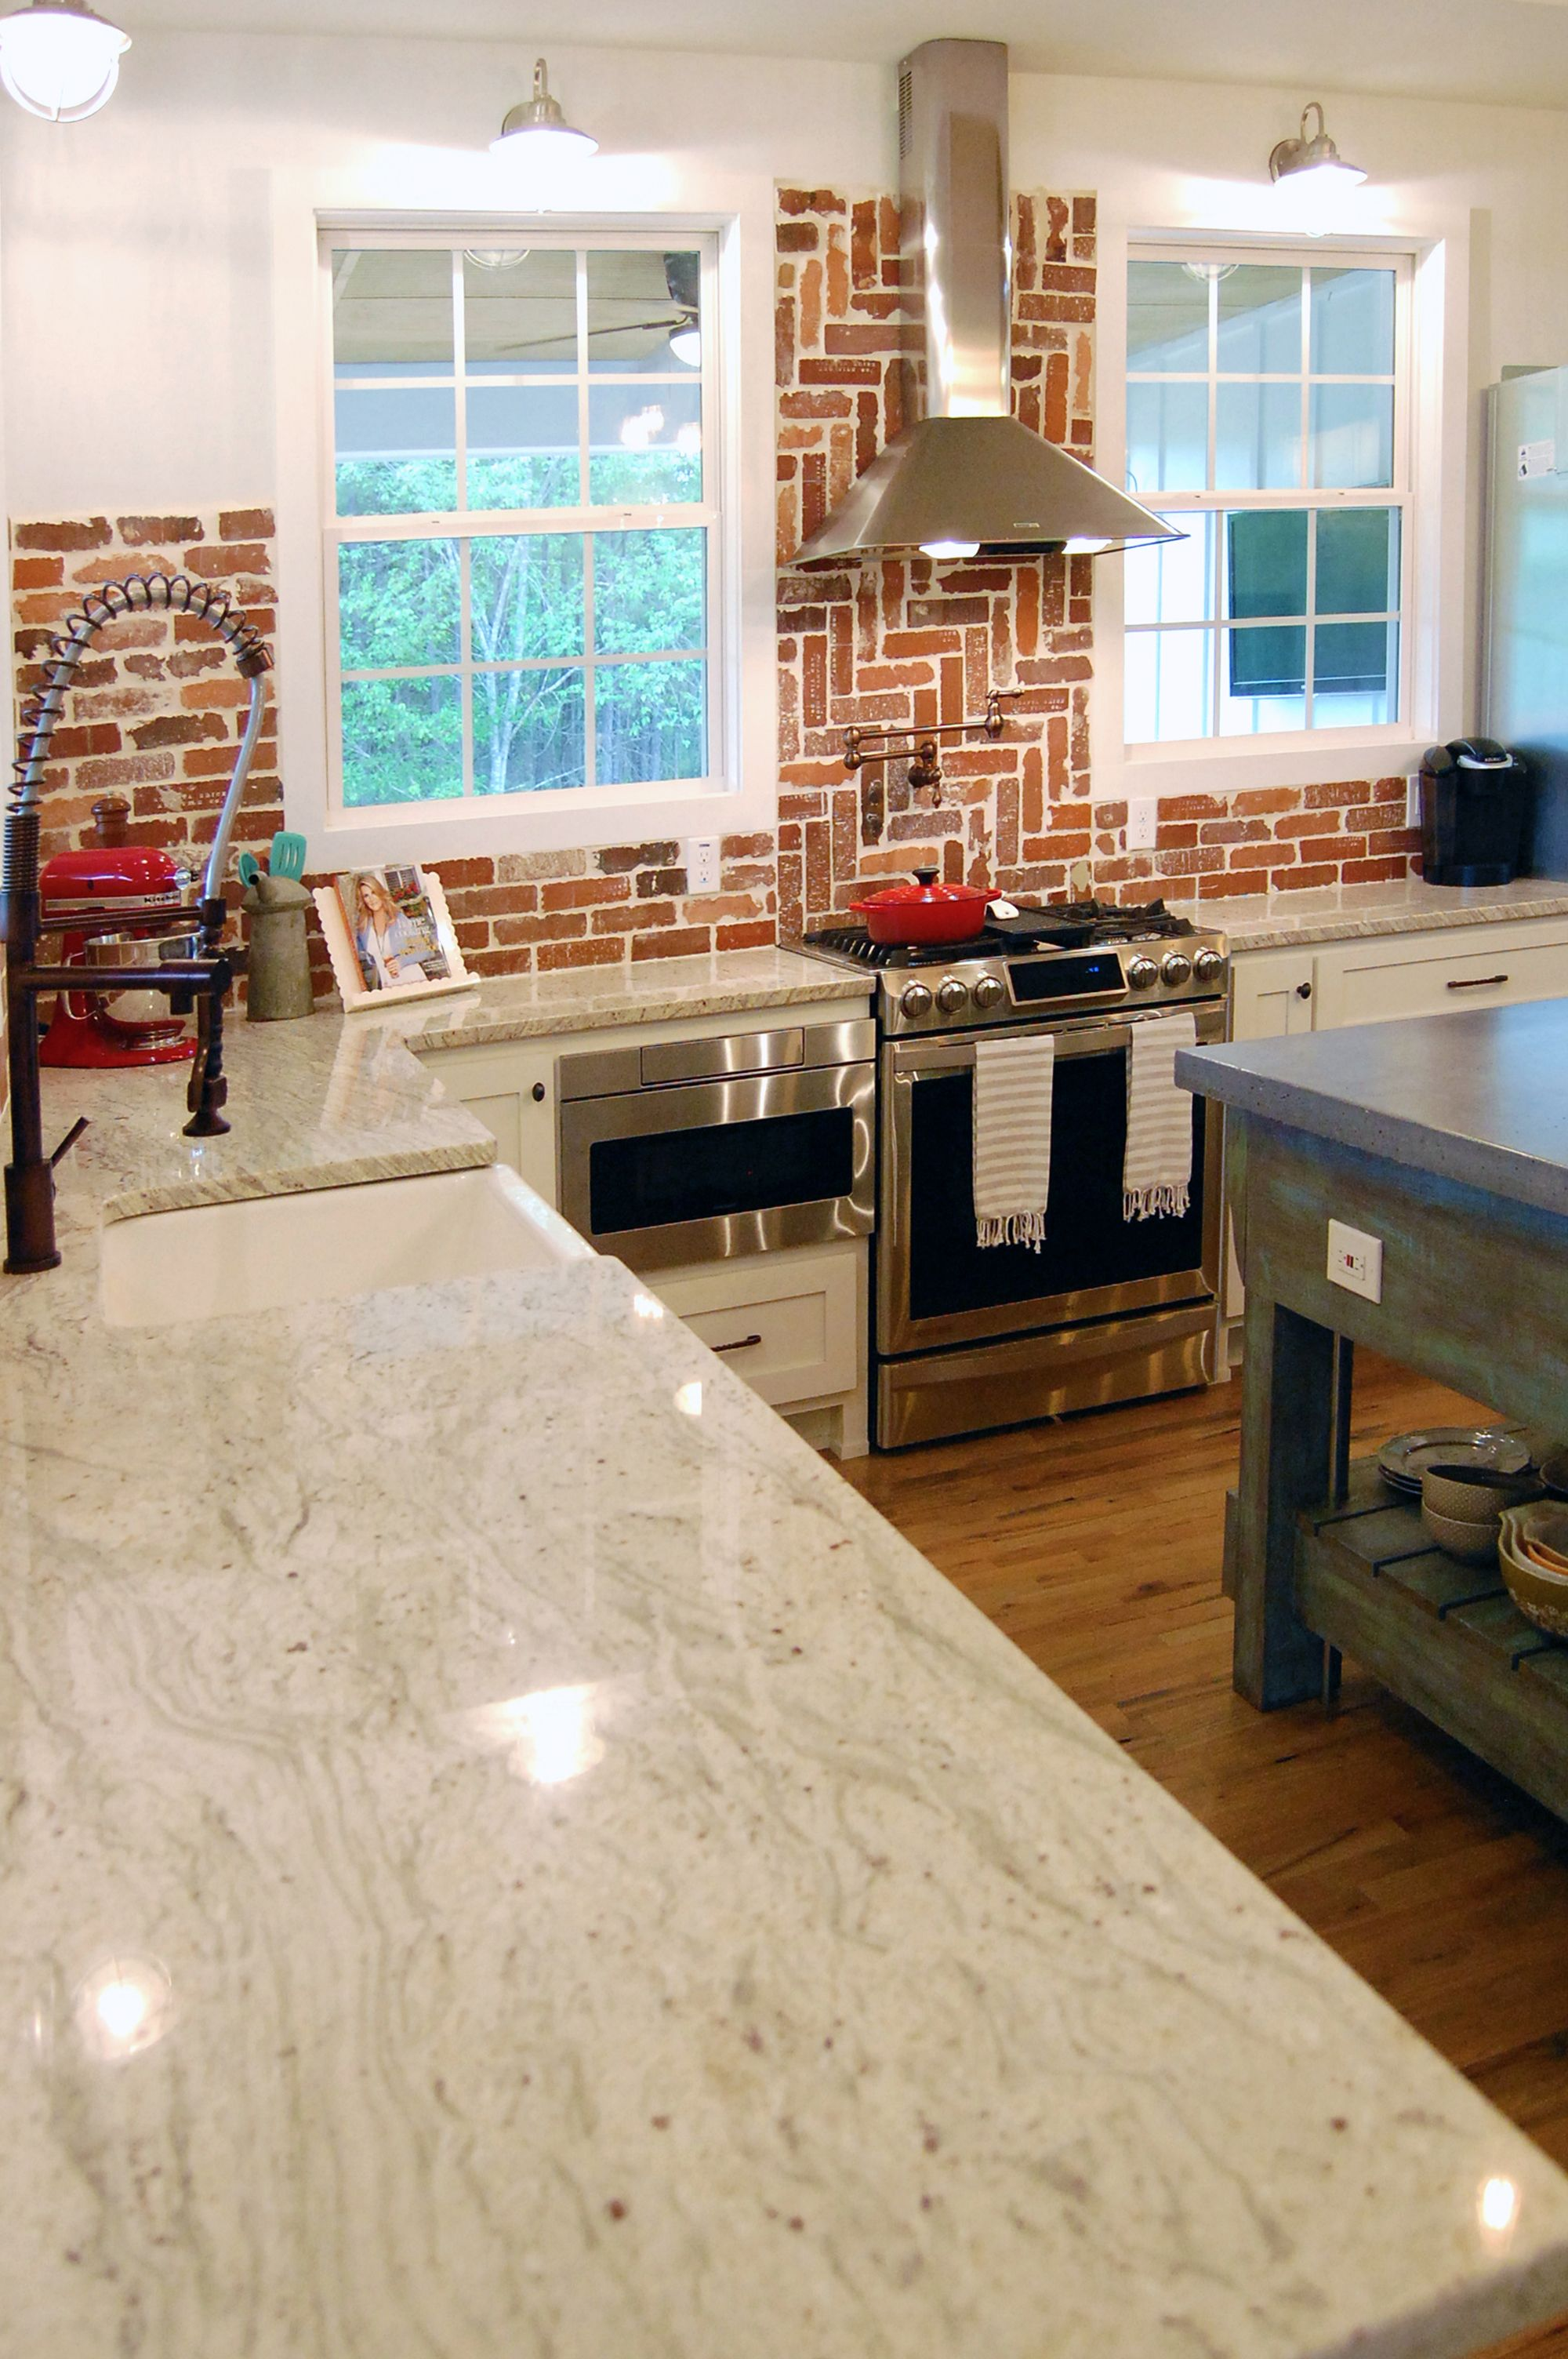 Industrial farmhouse kitchen, favorite part is the brick